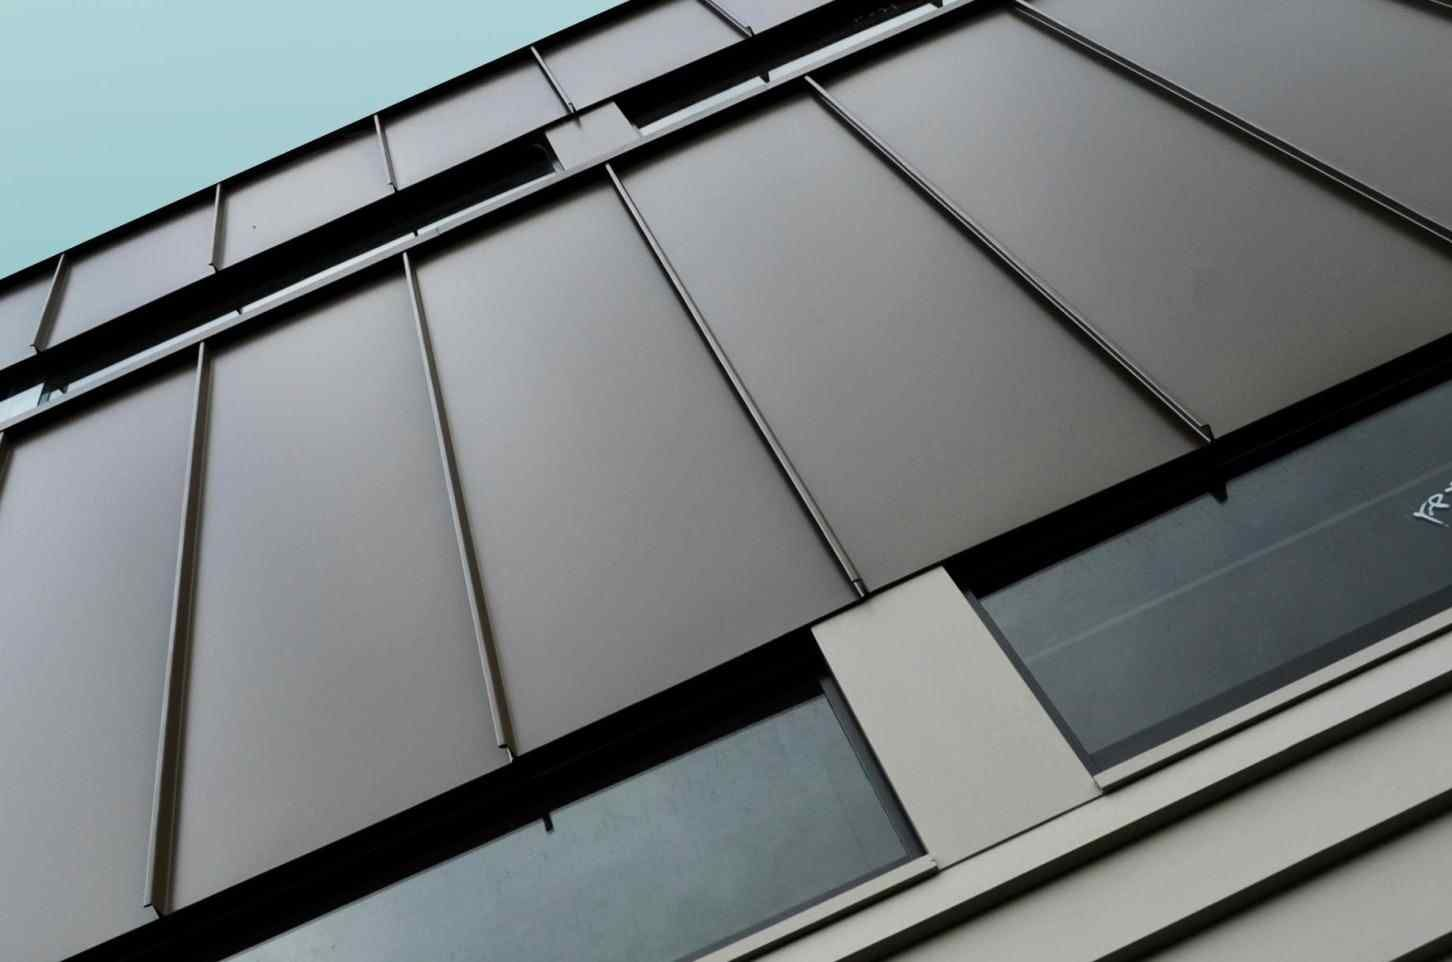 Single Seam Metal Roof Cladding, Wall cladding designs